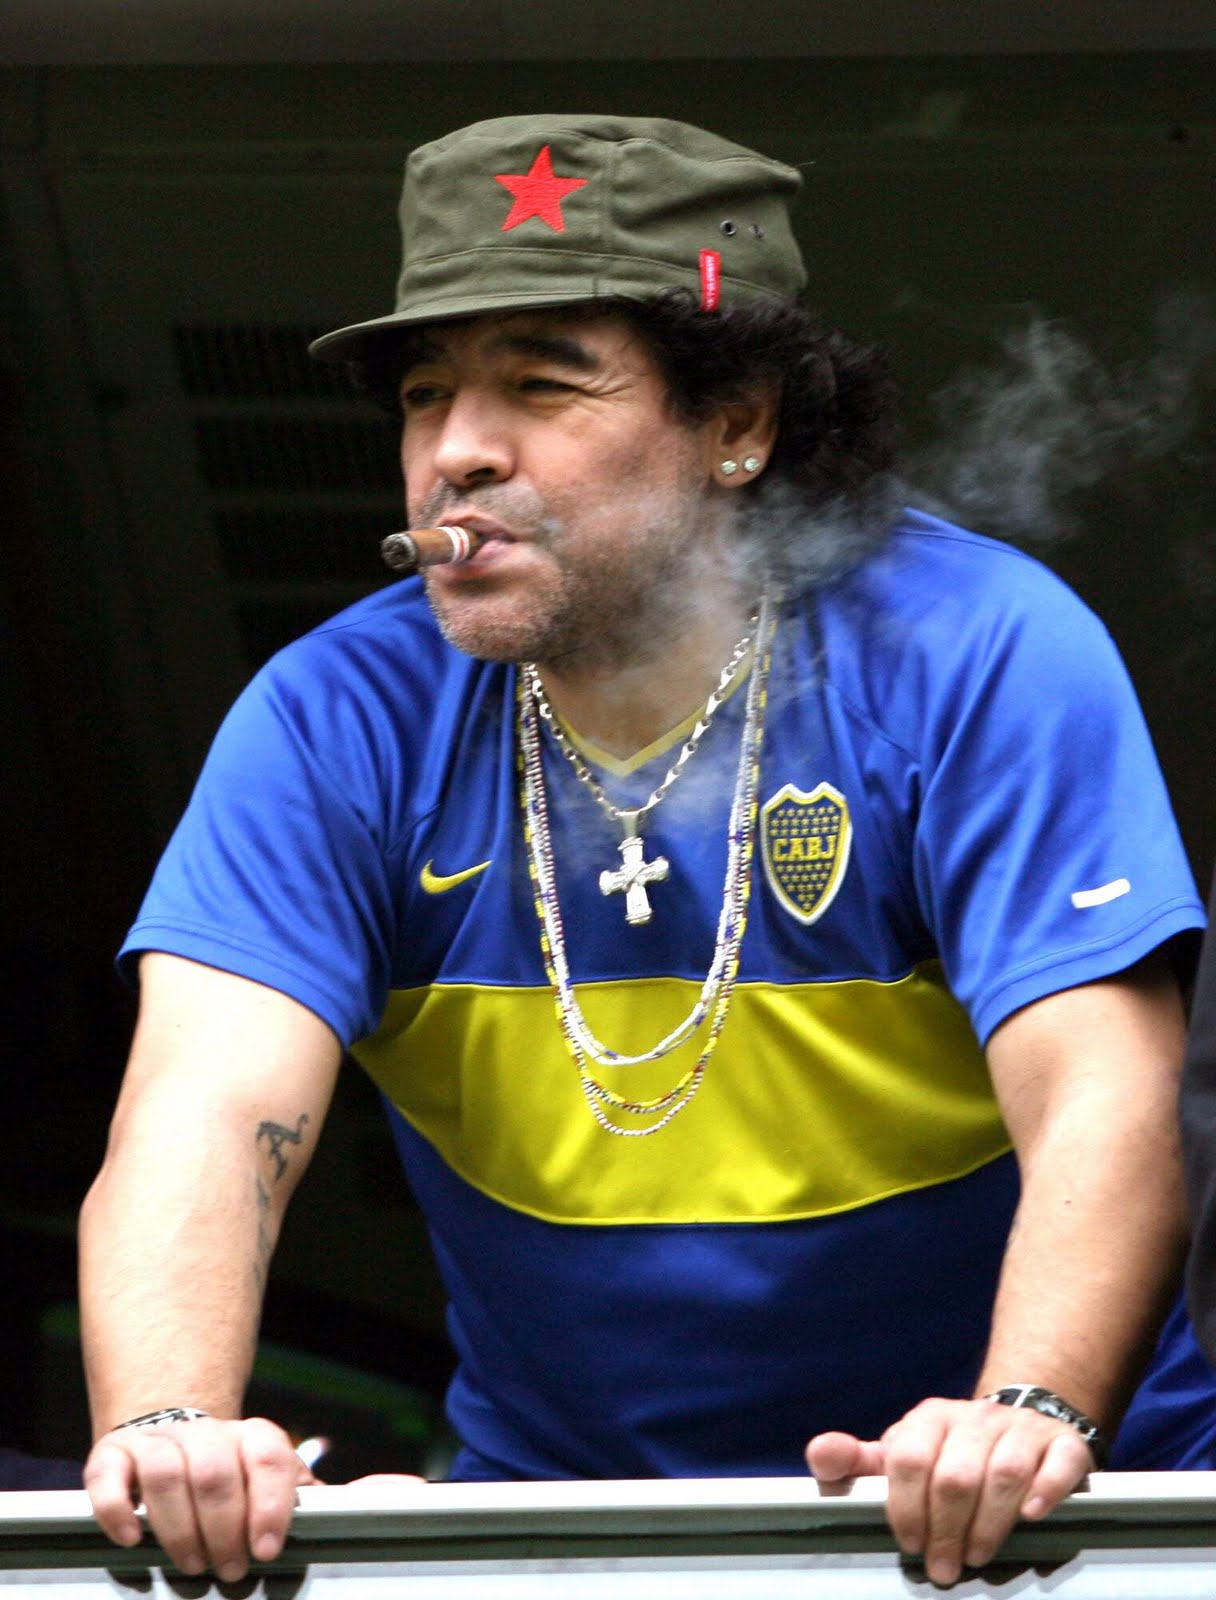 Diego Maradona photo 1 of 4 pics wallpaper photo